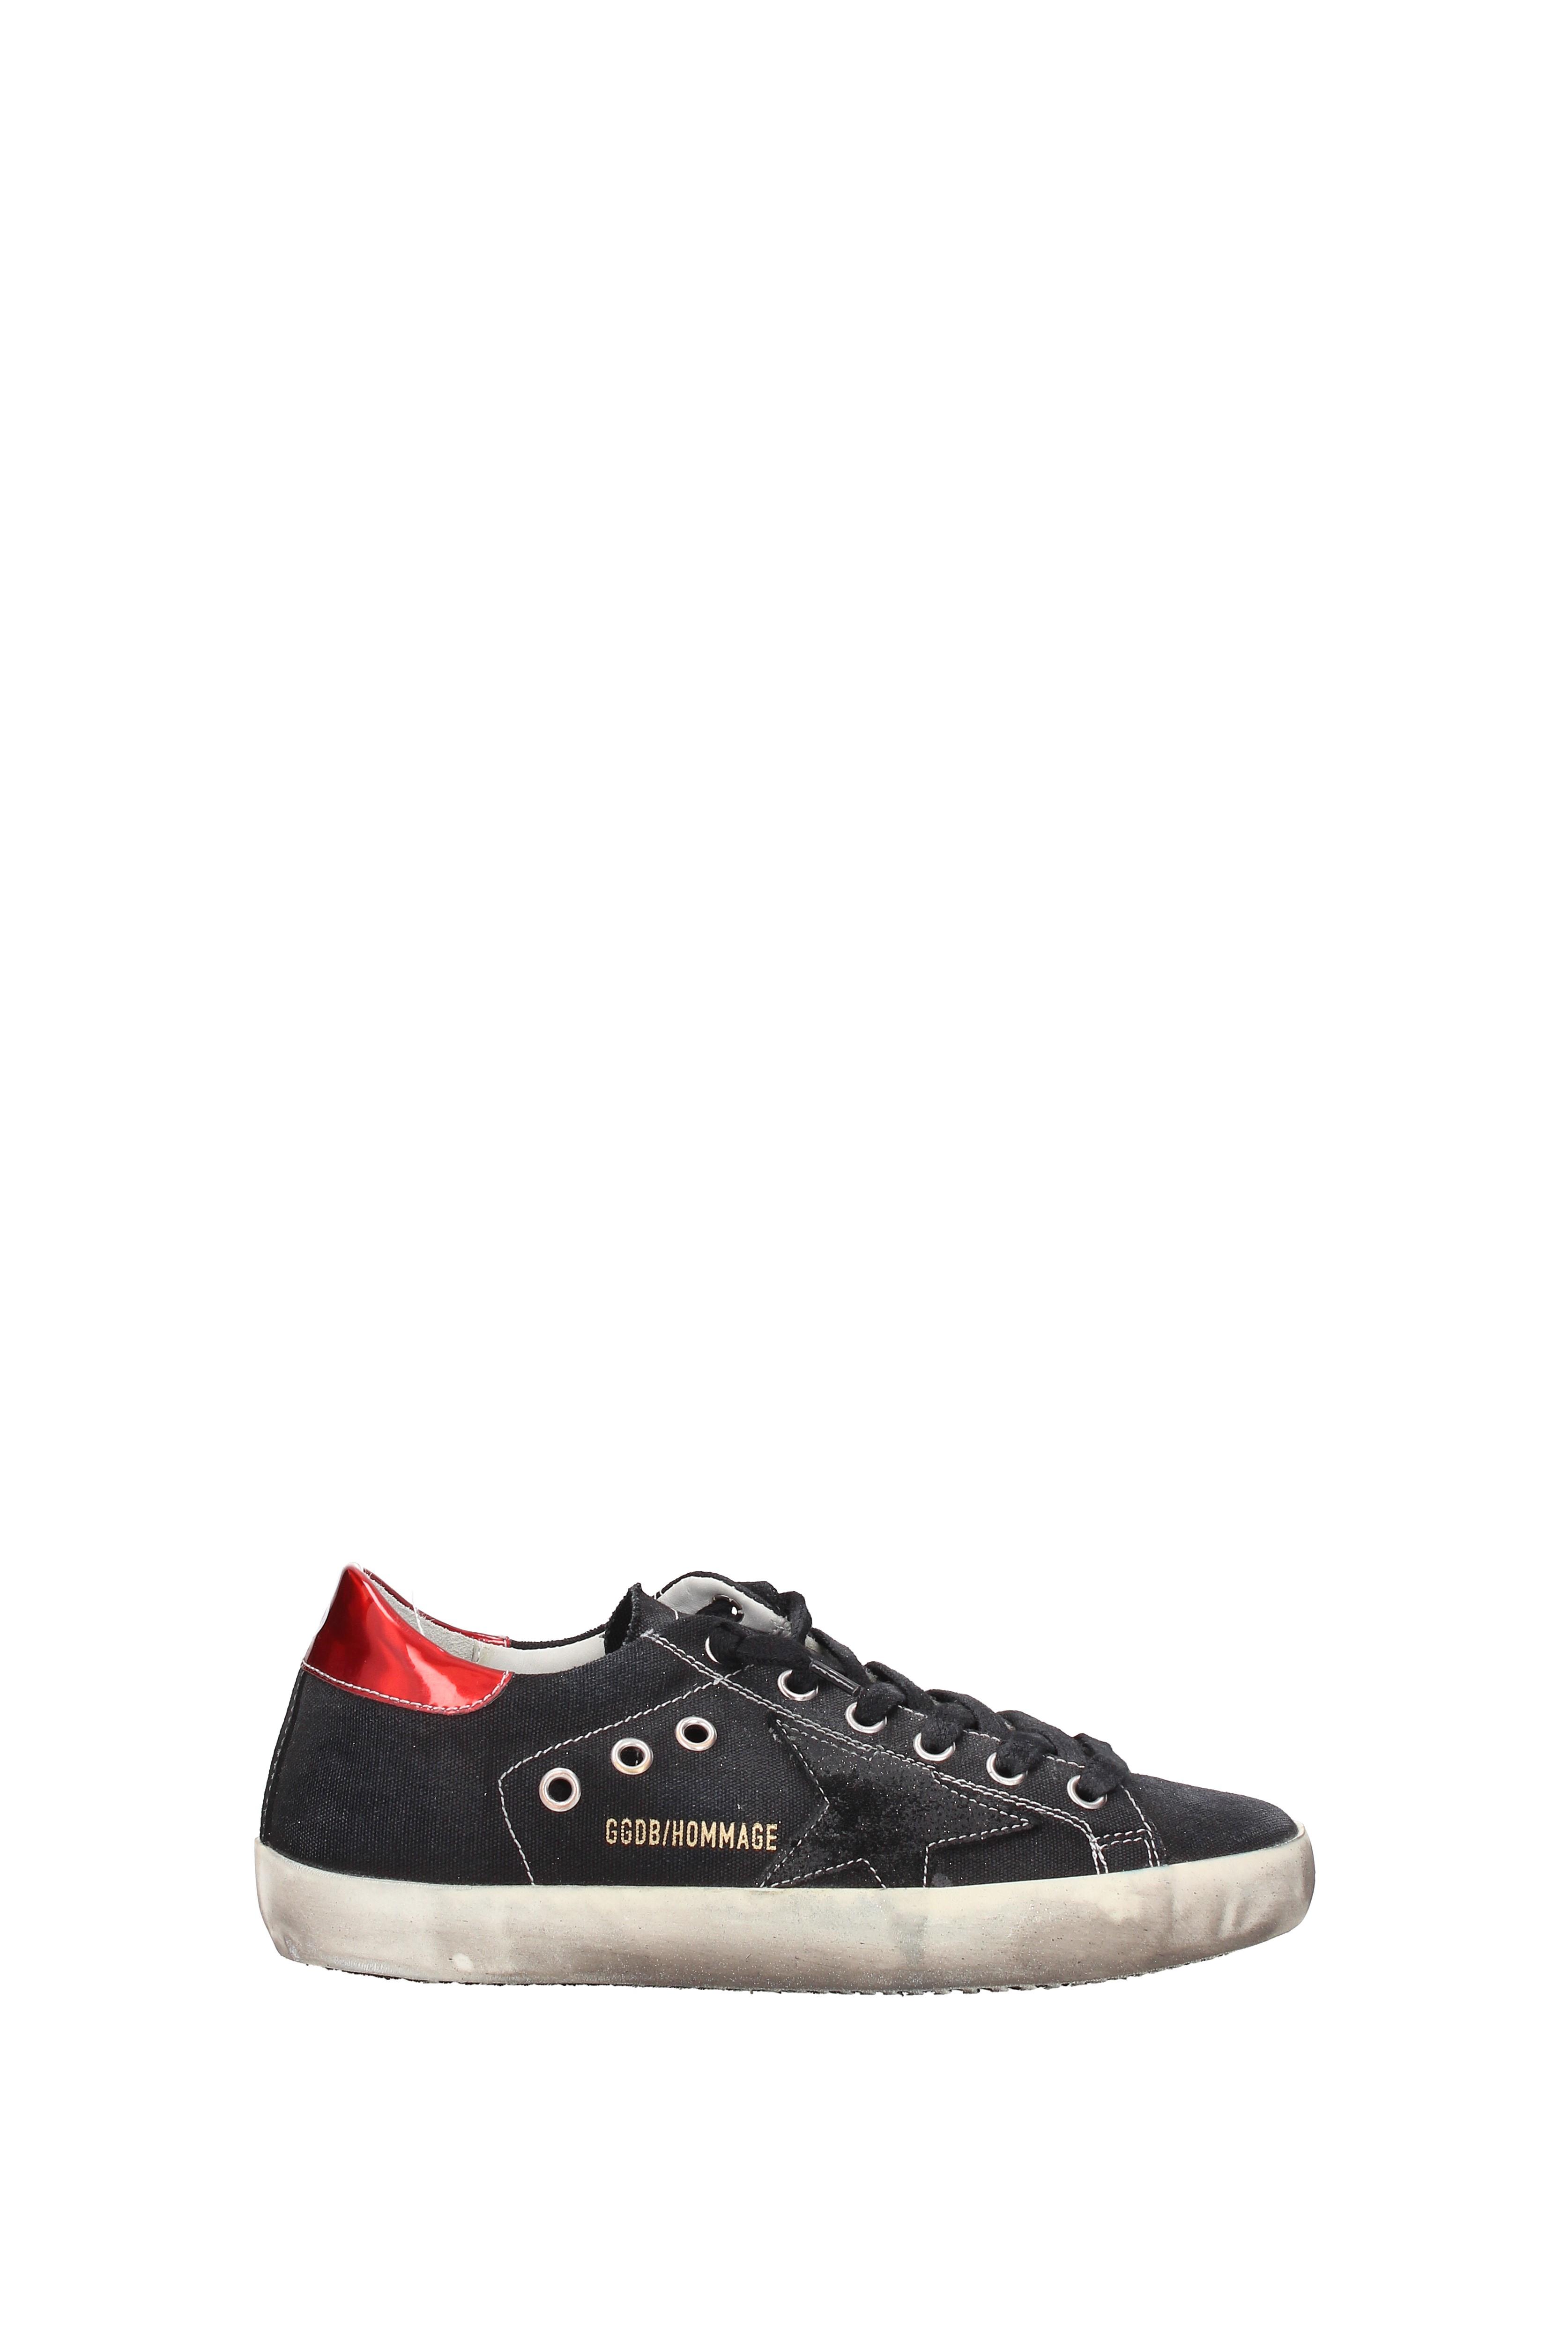 Zapatos HIDEJACK mujer CLFLLHTWHT MARRONE Pelle naturale CLFLLHTWHT mujer 439902